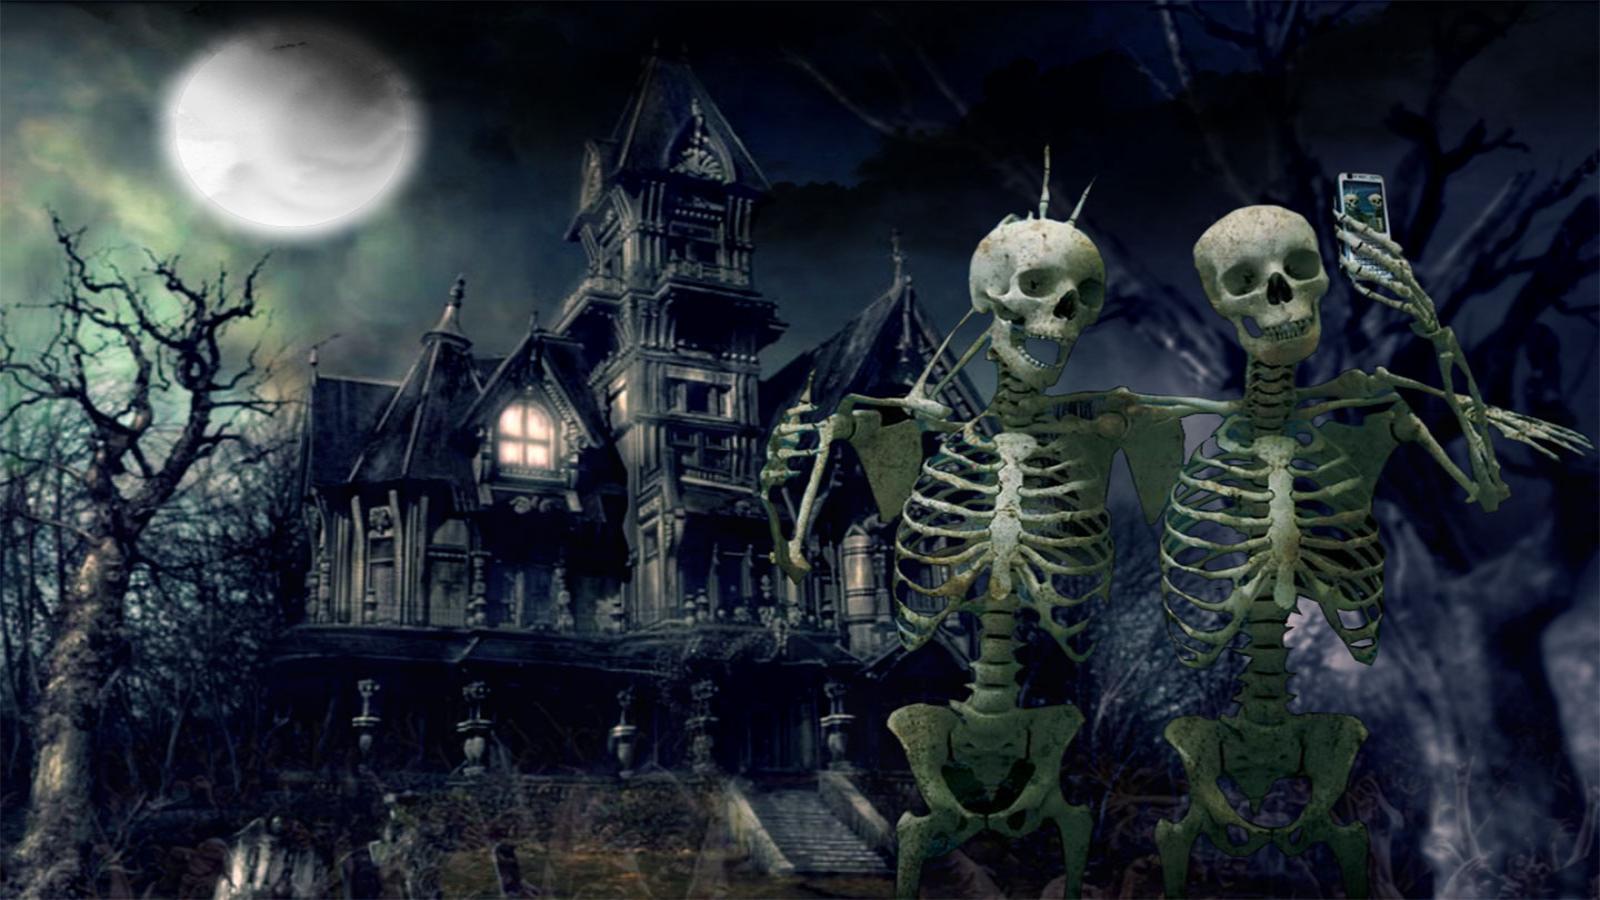 Scary Halloween Desktop Wallpaper - WallpaperSafari